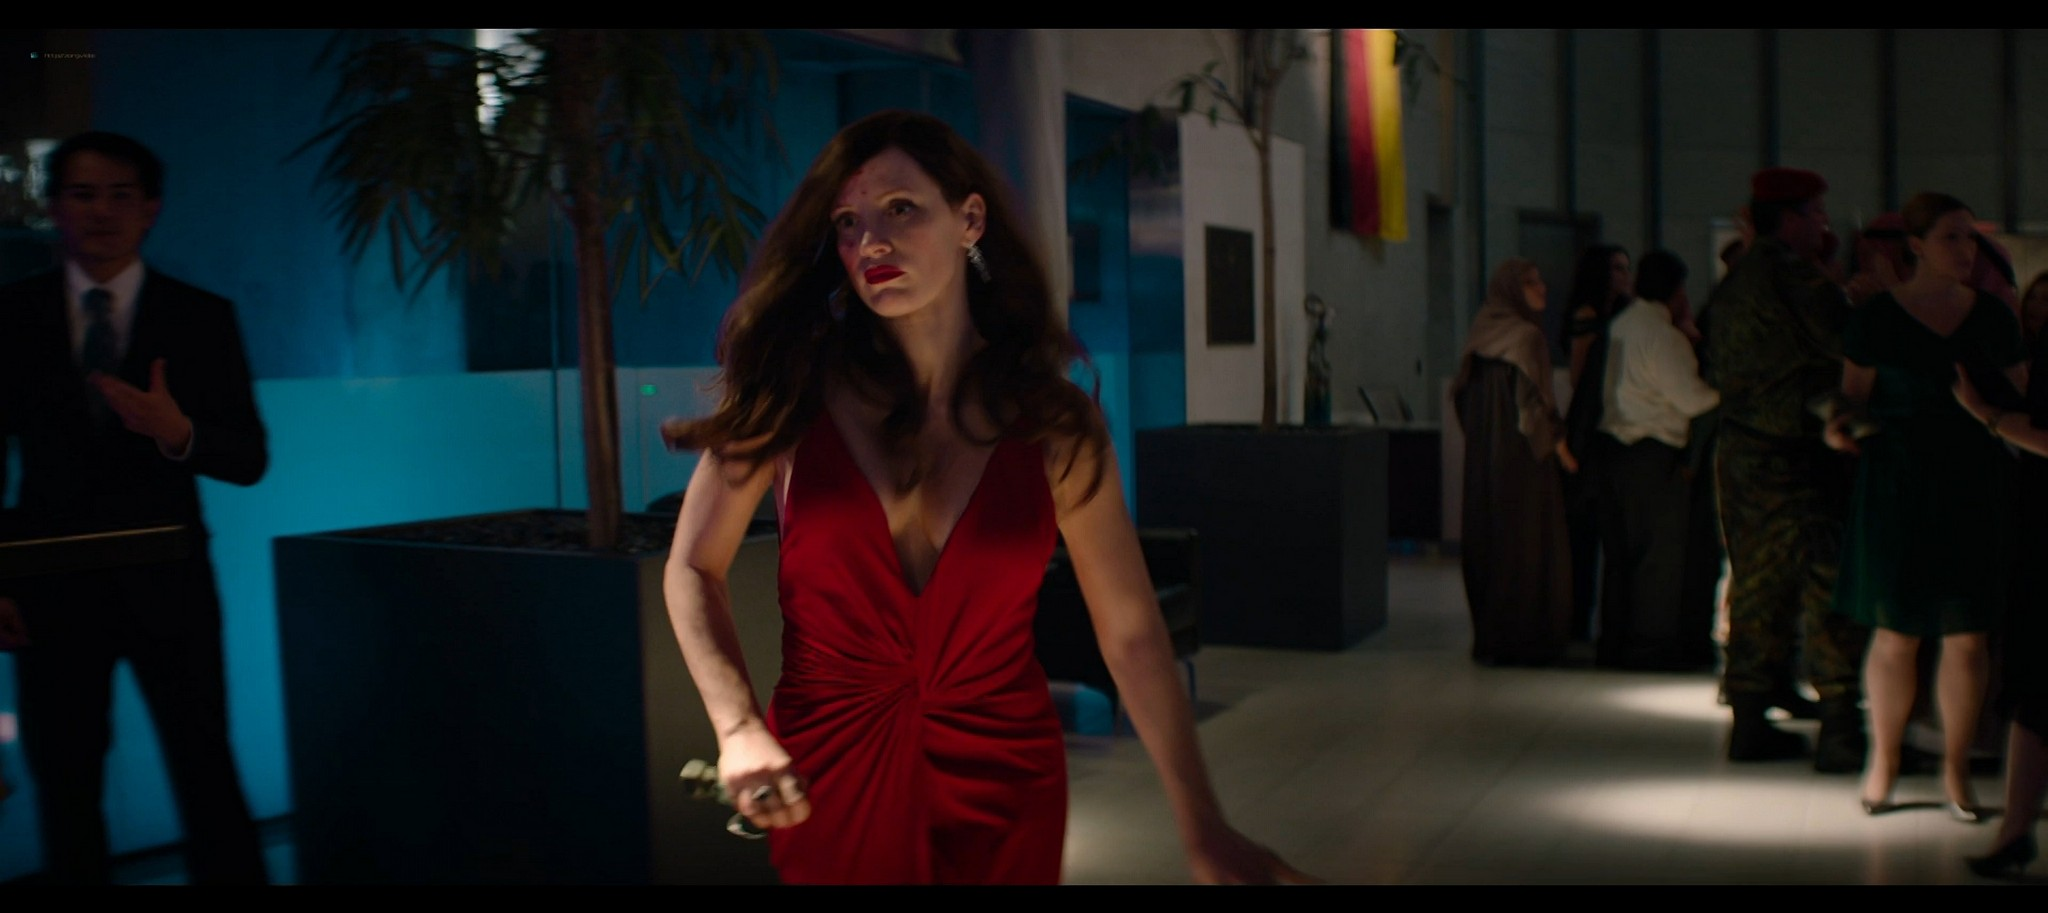 Jessica Chastain hot Jess Weixler sexy Ava 2020 HD 1080p BluRay REMUX 013